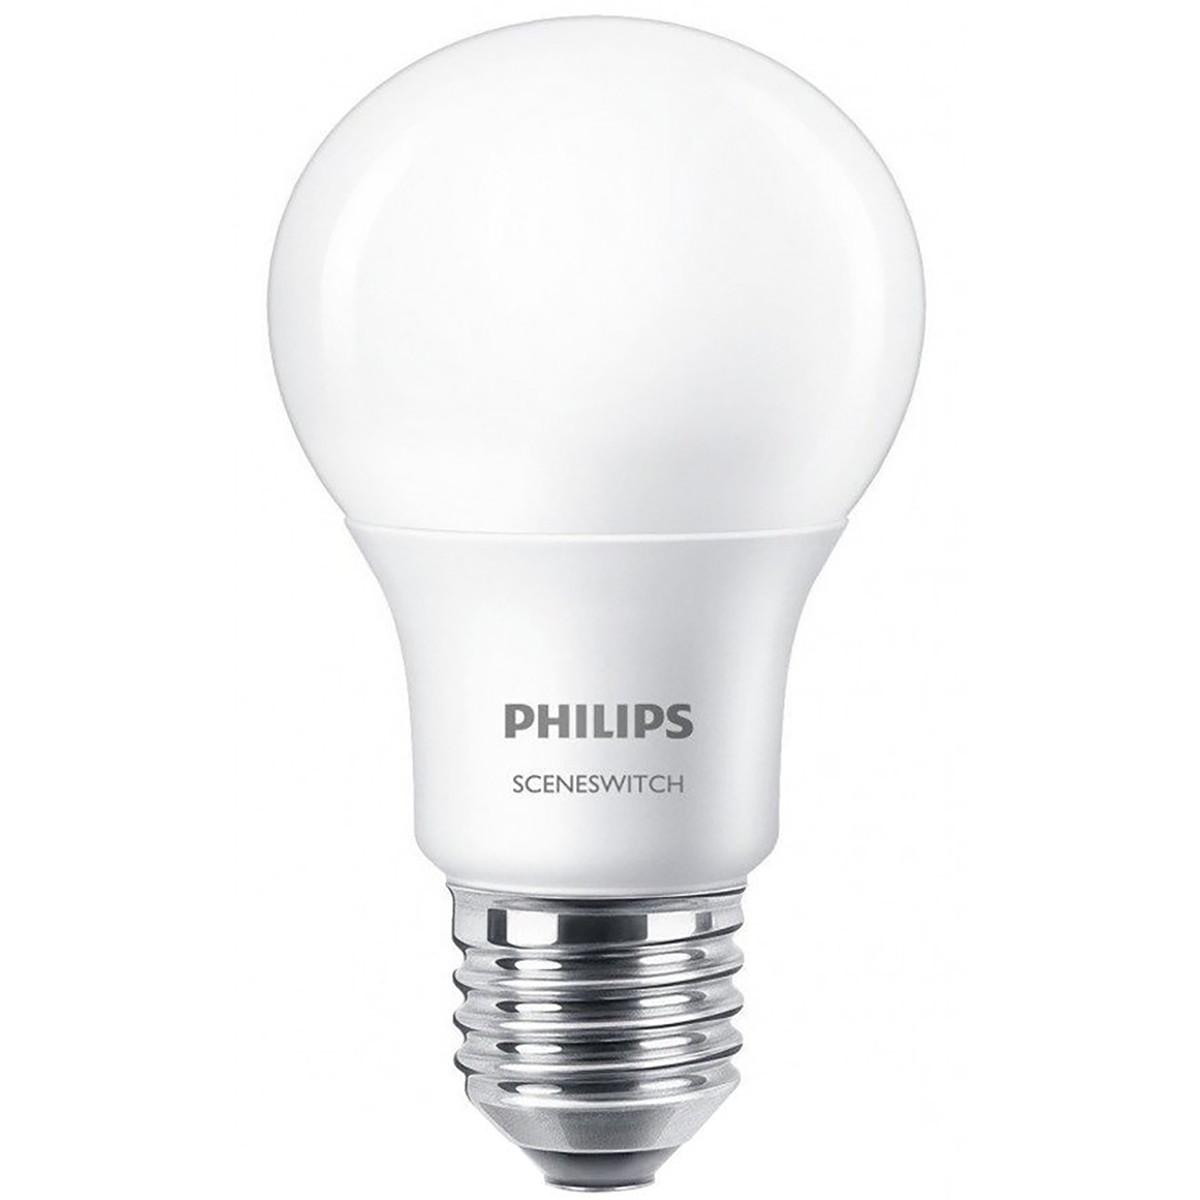 PHILIPS - LED Lamp - SceneSwitch 827 A60 - E27 Fitting - Dimbaar - 2W-8W - Warm Wit 2200K-2700K | Ve